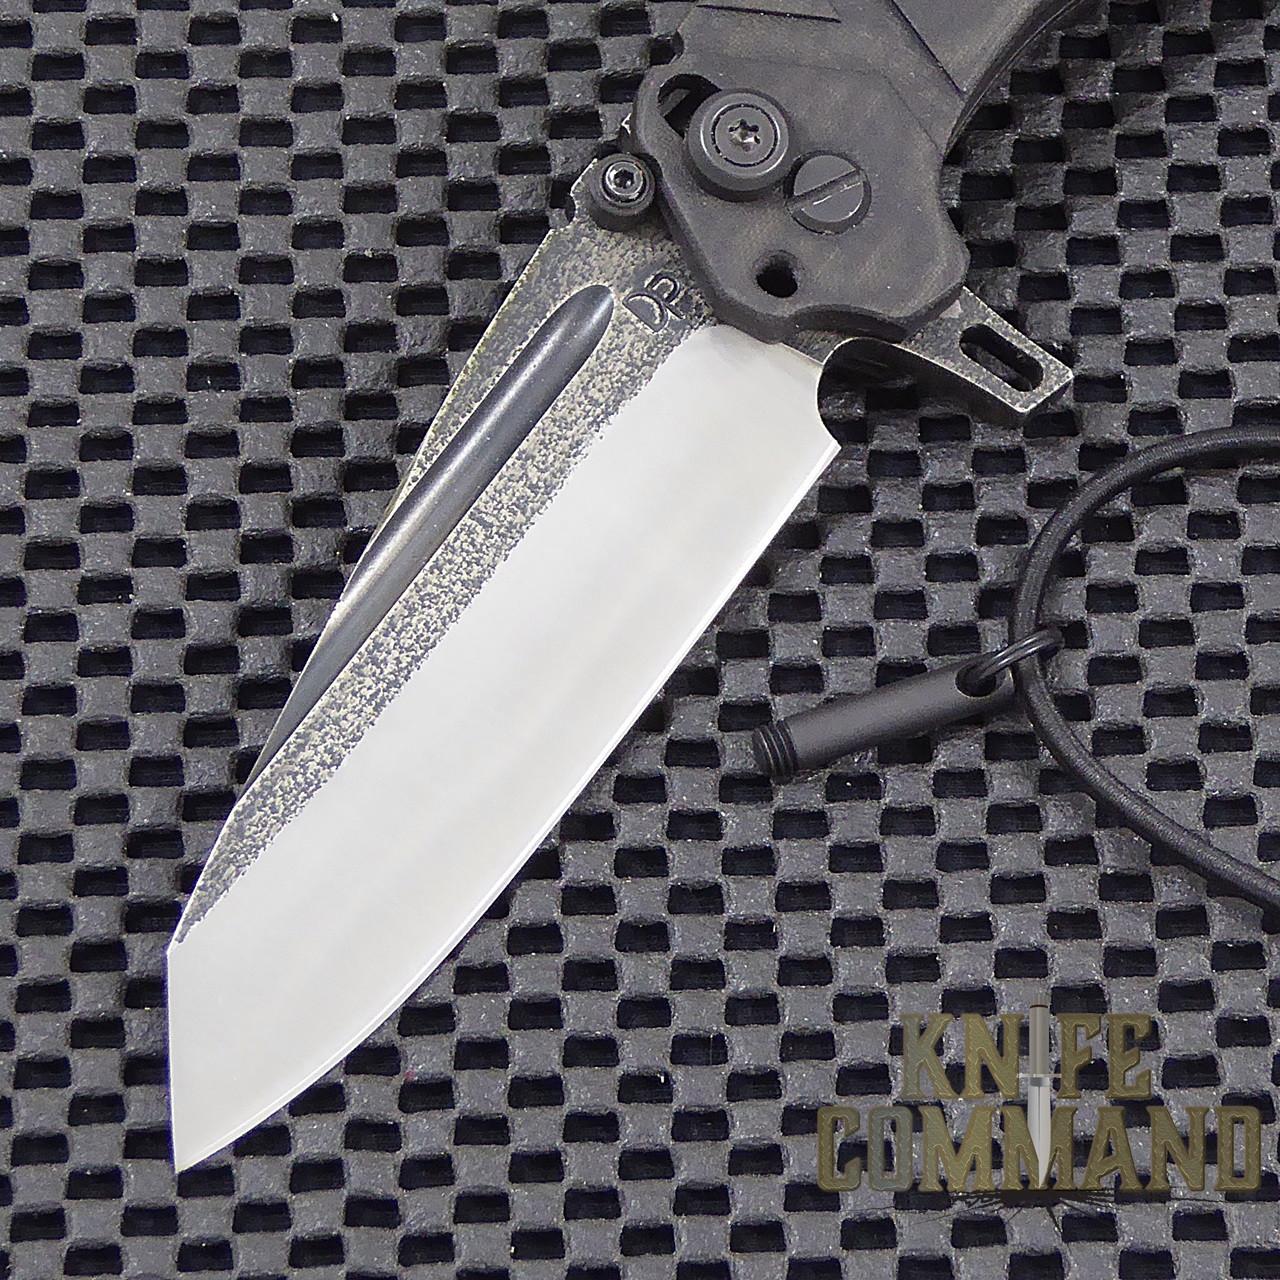 Wander Tactical Custom Sköll Wolf Extreme Duty Folding Knife.  Custom Two-Tone D2 blade with lock pin.